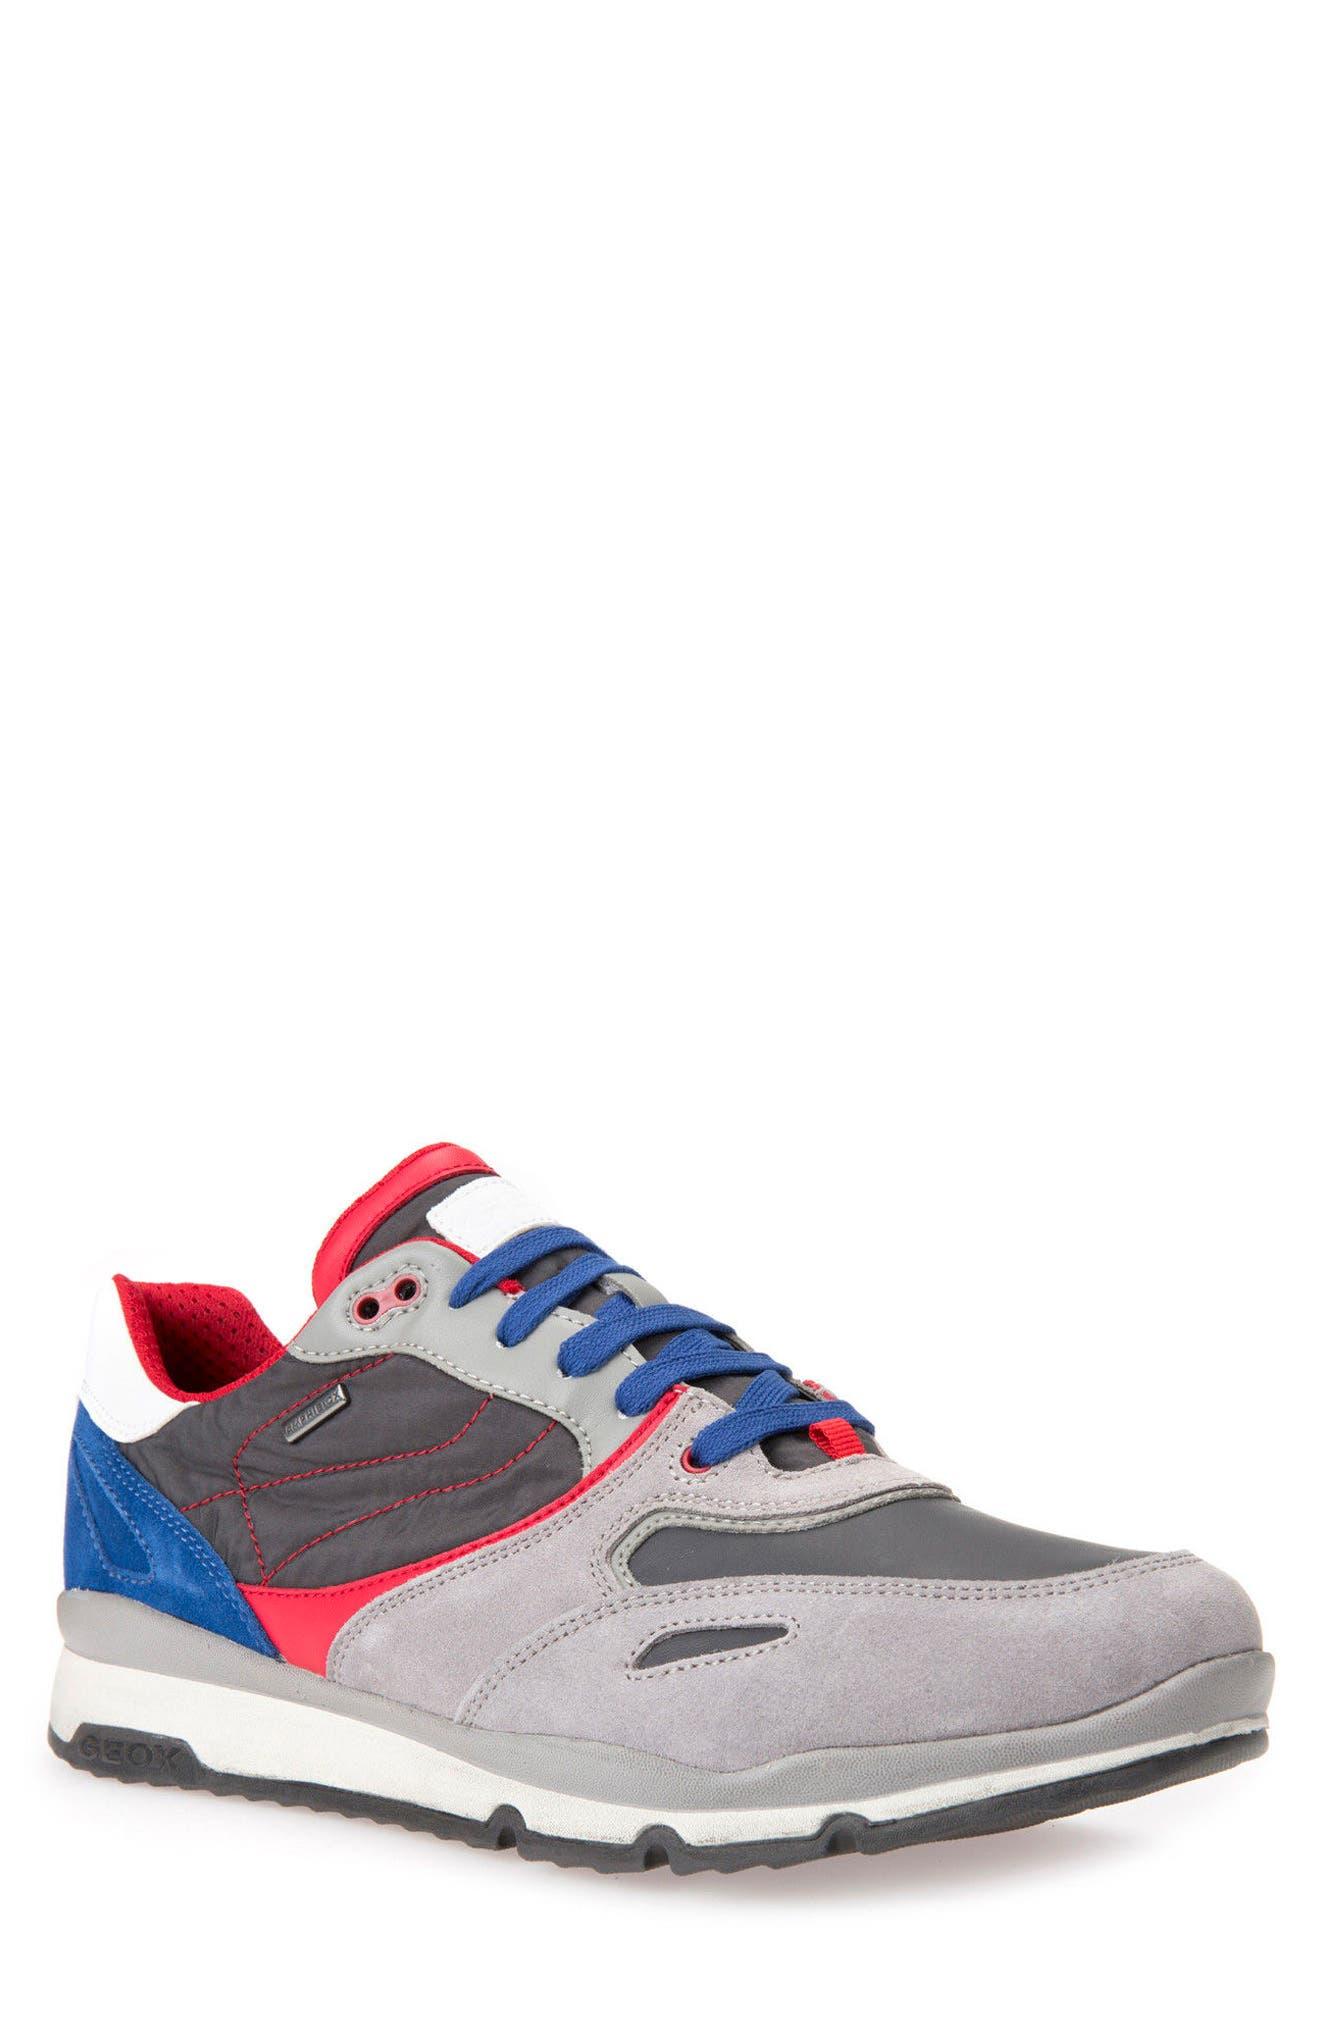 Main Image - Geox Sandro ABX Ambphibiox Waterproof Sneaker (Men)